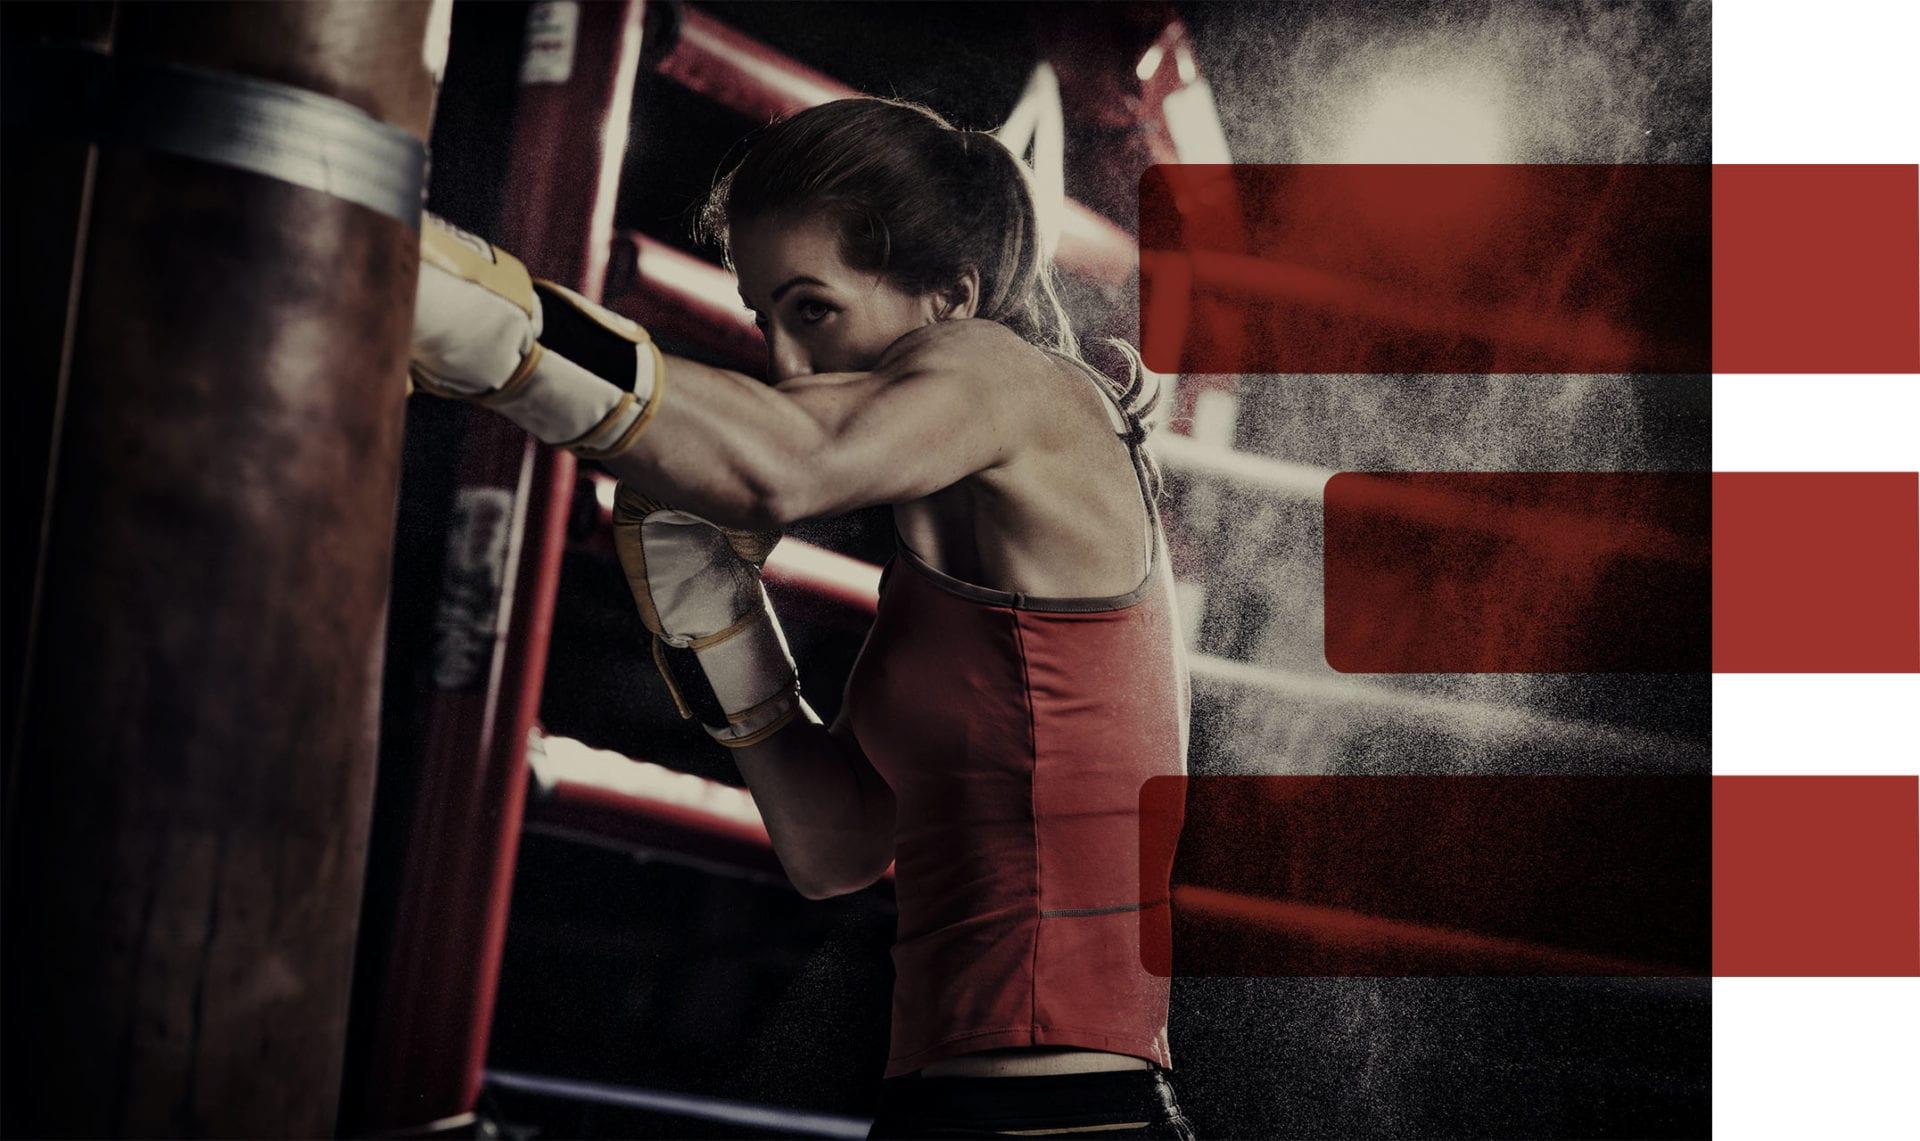 Woman boxing at X3 Sports